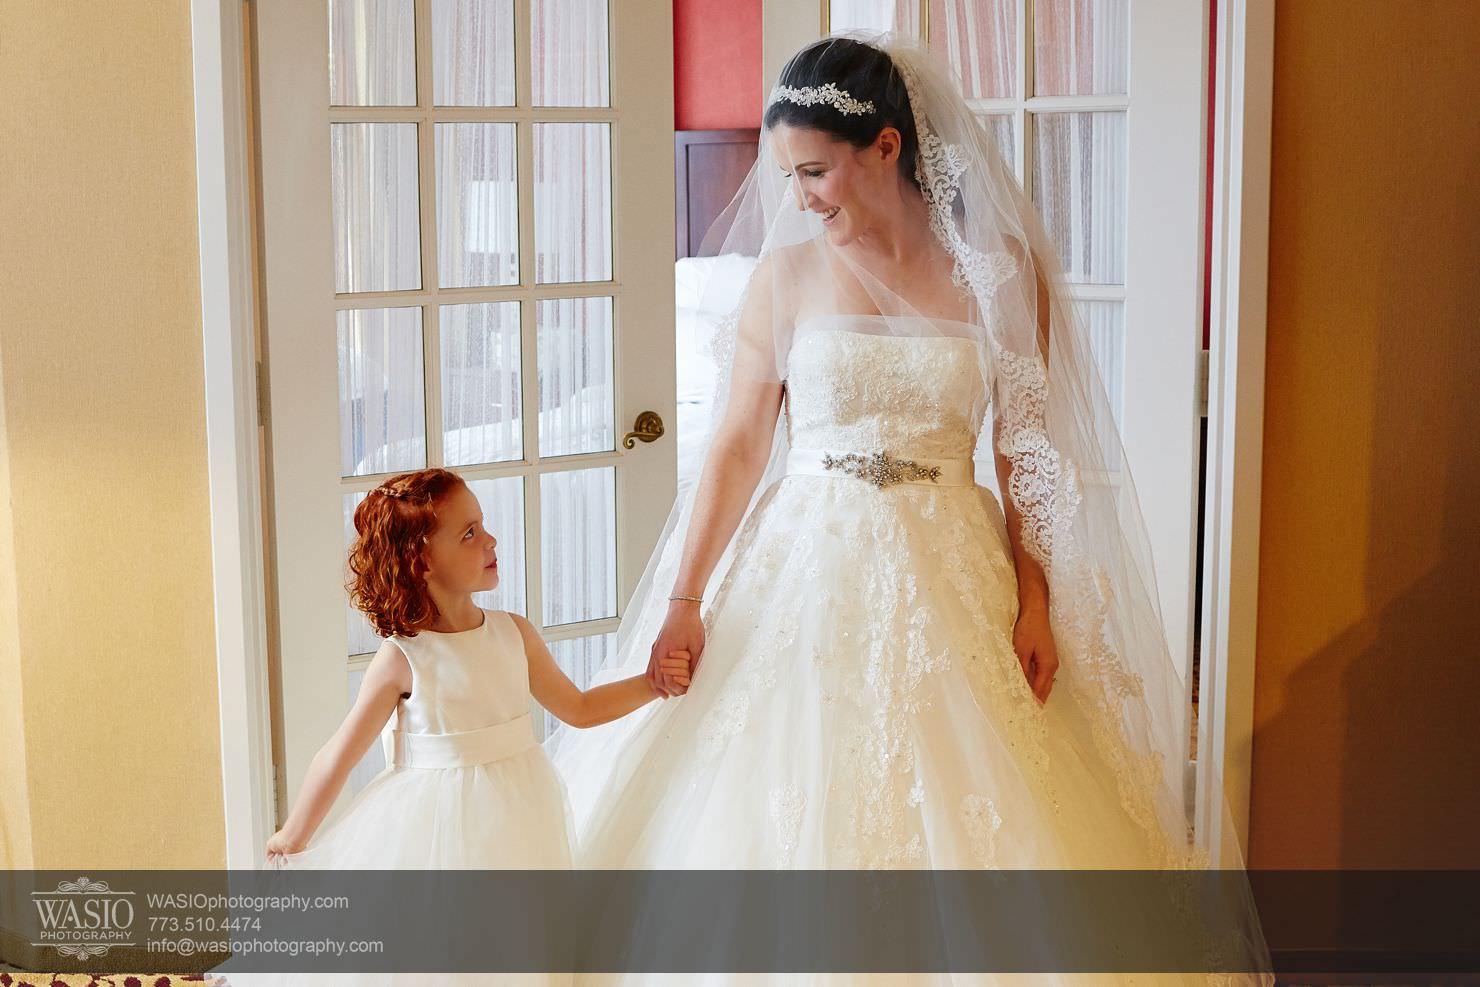 Rosemont-Fall-Wedding-Lauren-and-David-005 Rosemont Fall Wedding - Lauren + David